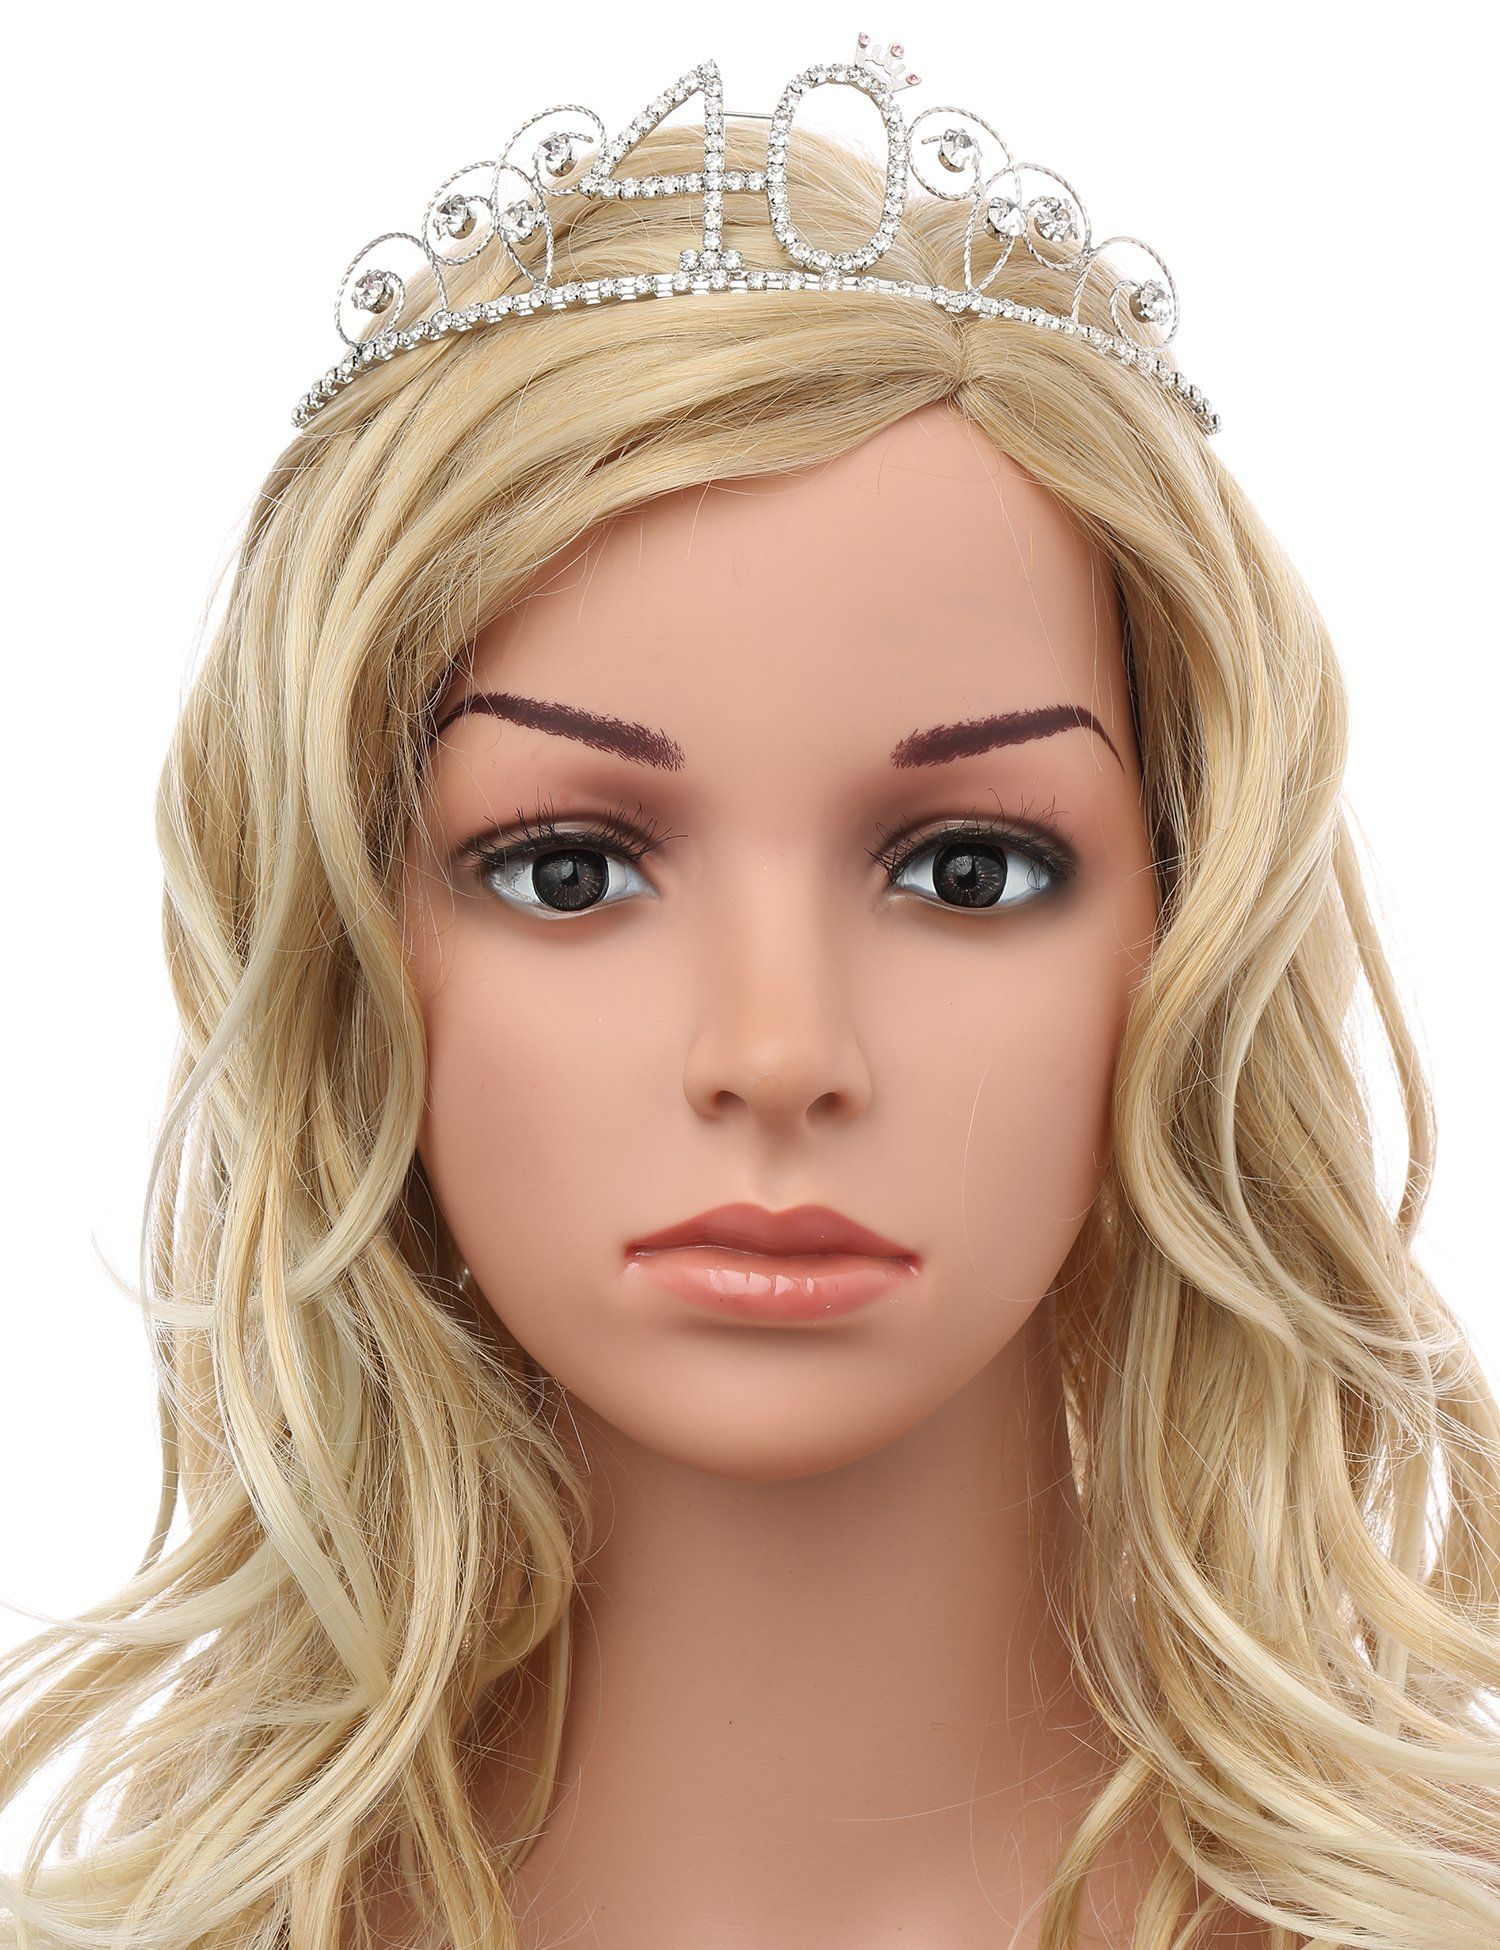 Babeyond crystal tiara birthday crown princess crown hair